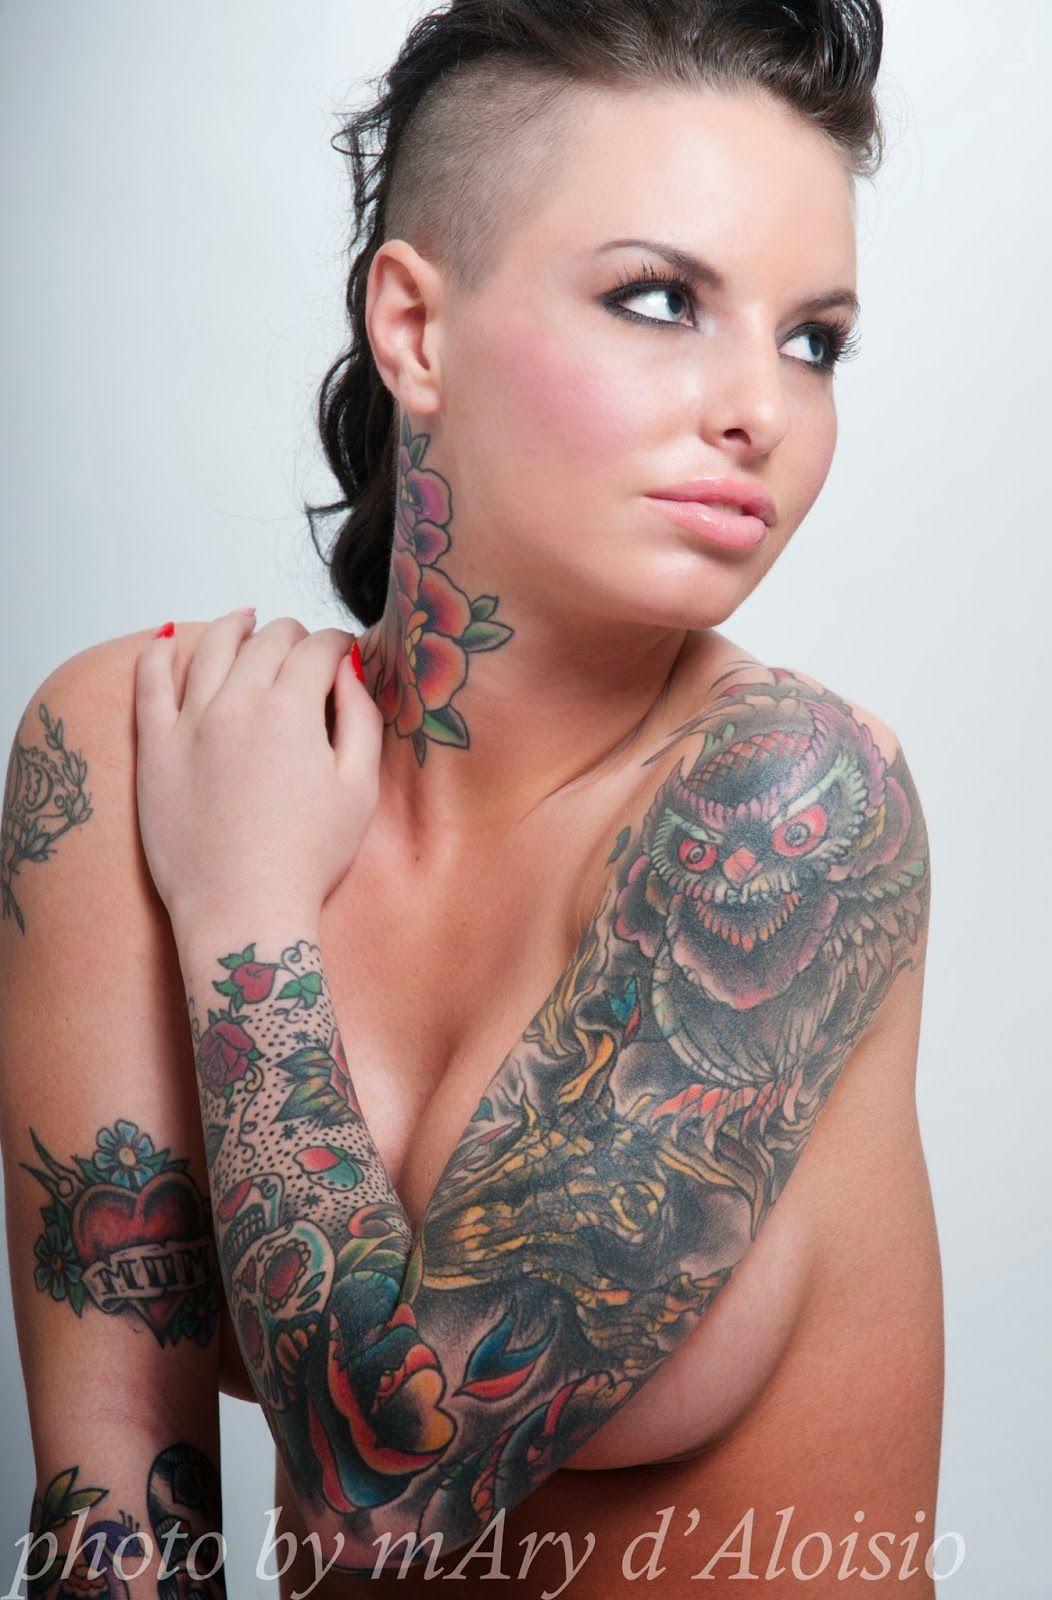 Tattoo peircings online porn